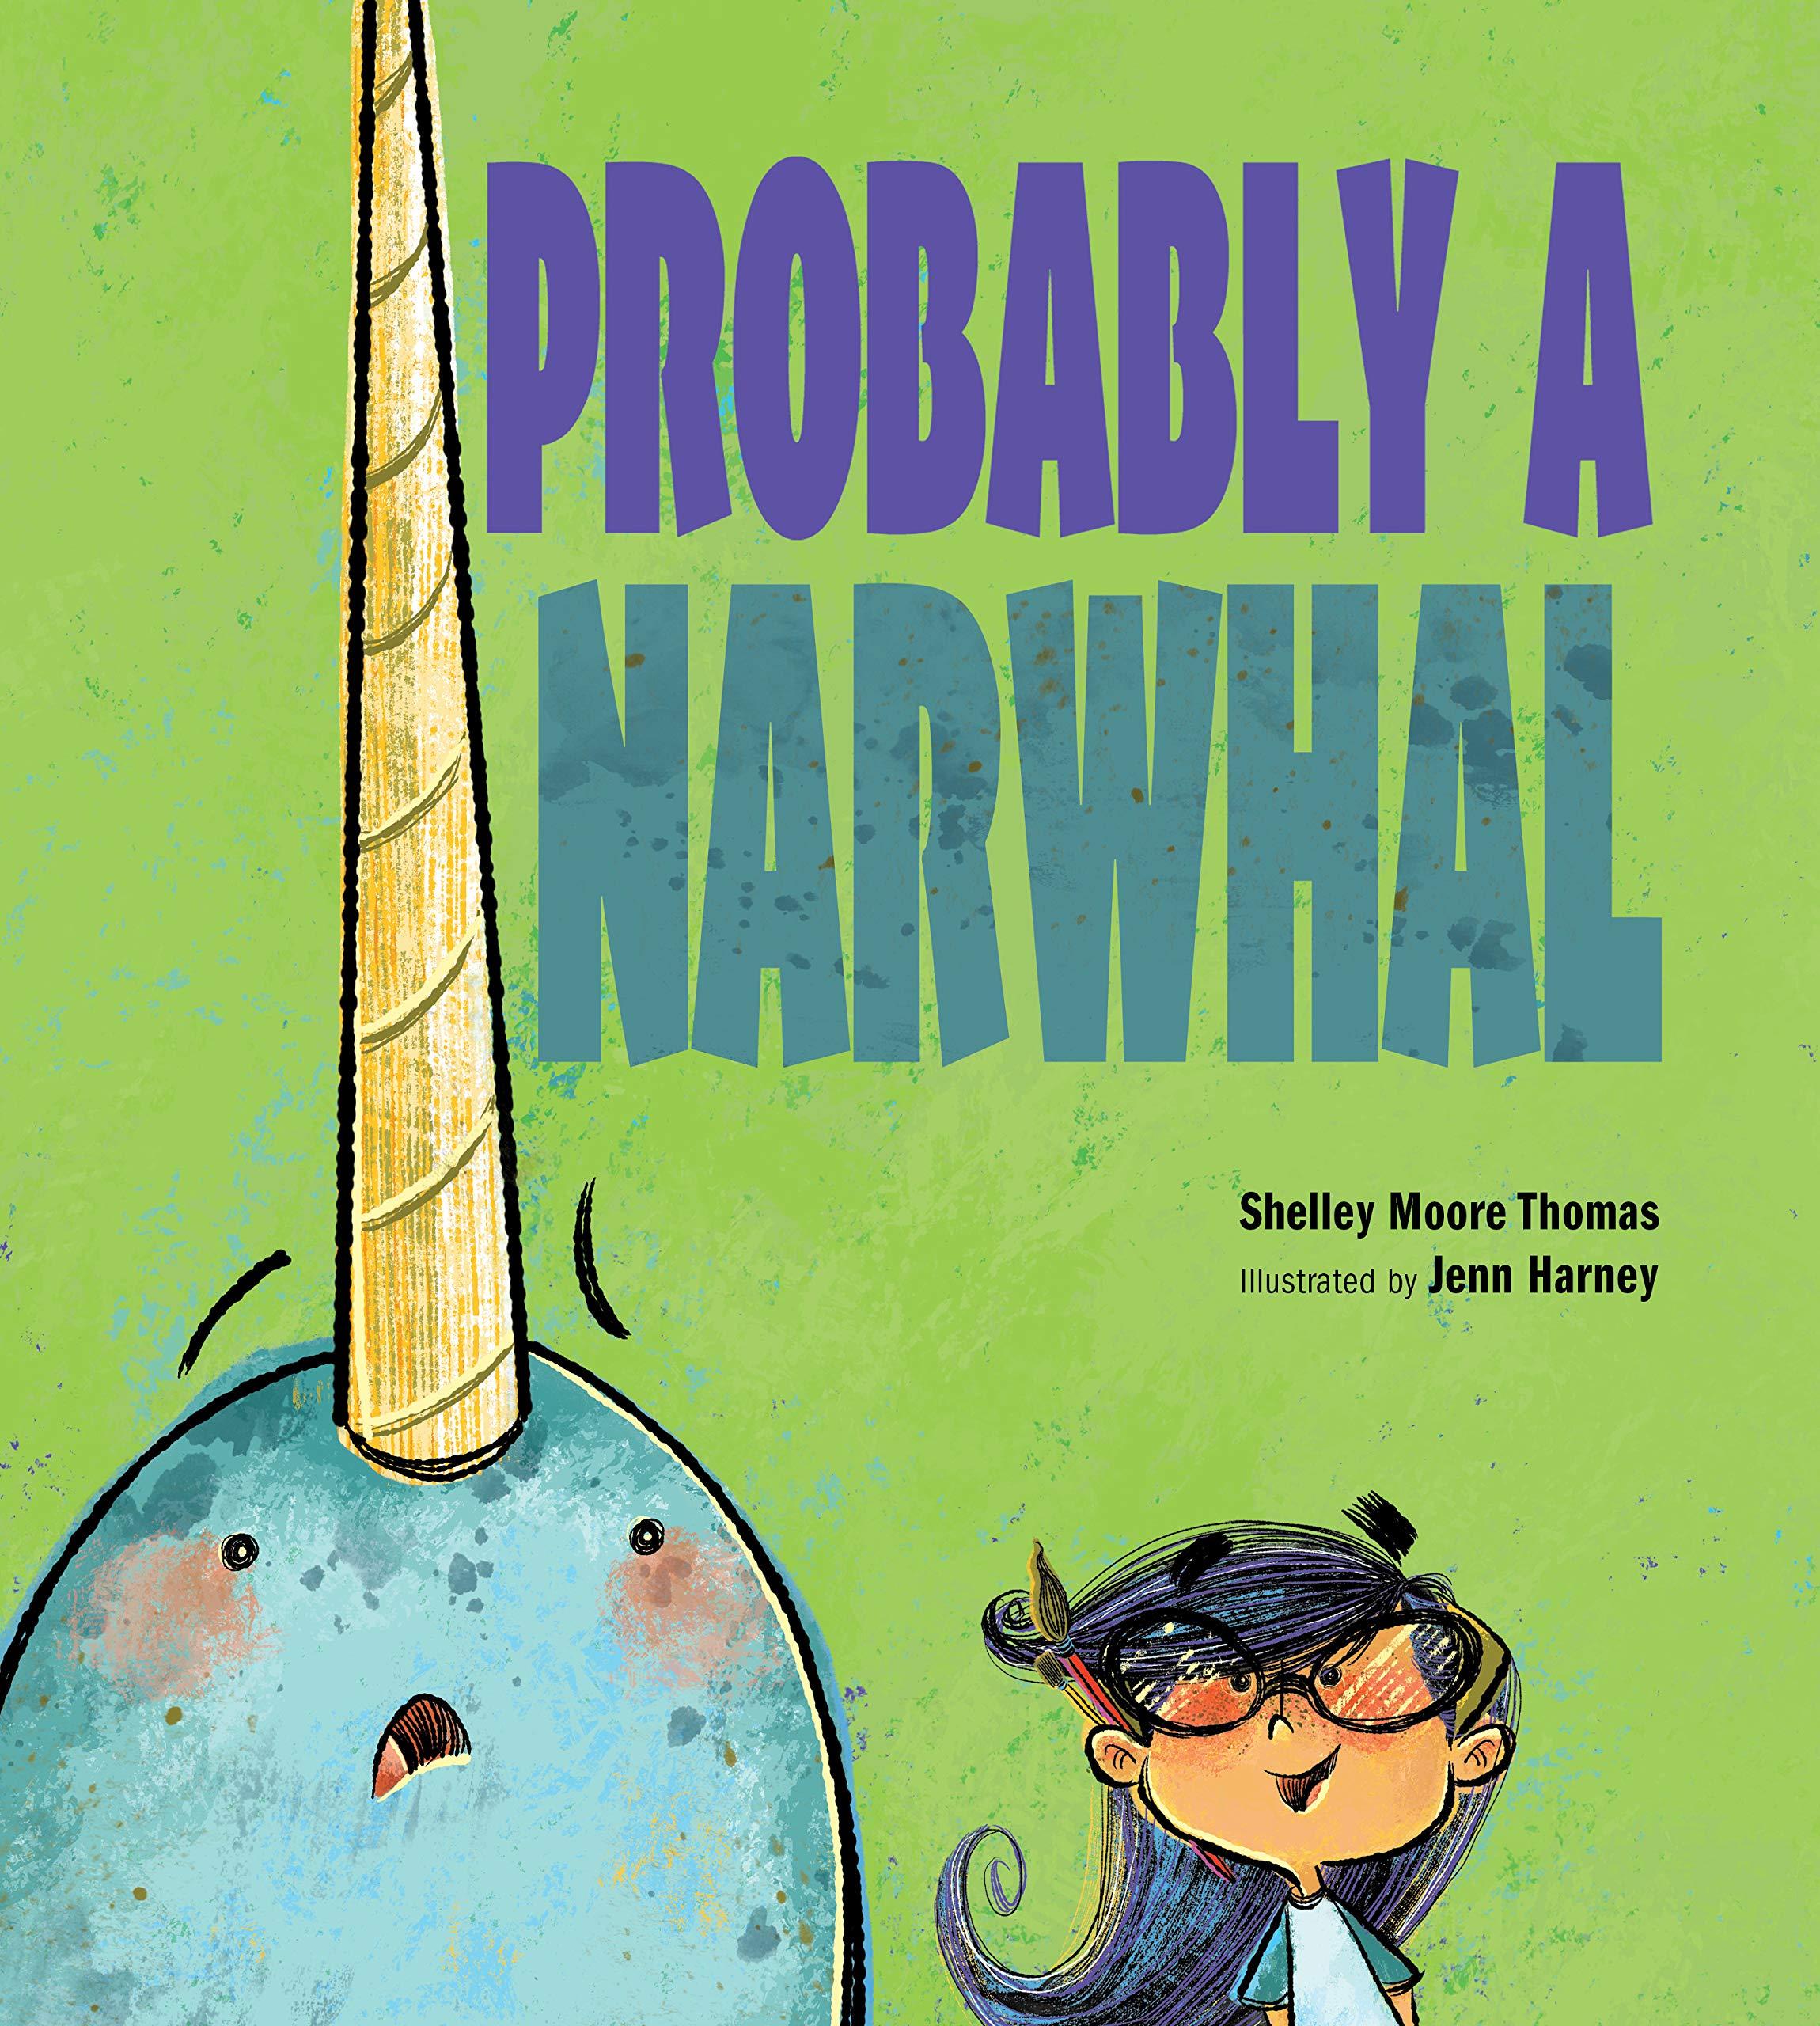 Probably a Narwhal: Thomas, Shelley Moore, Harney, Jenn: 9781629795812: Amazon.com: Books